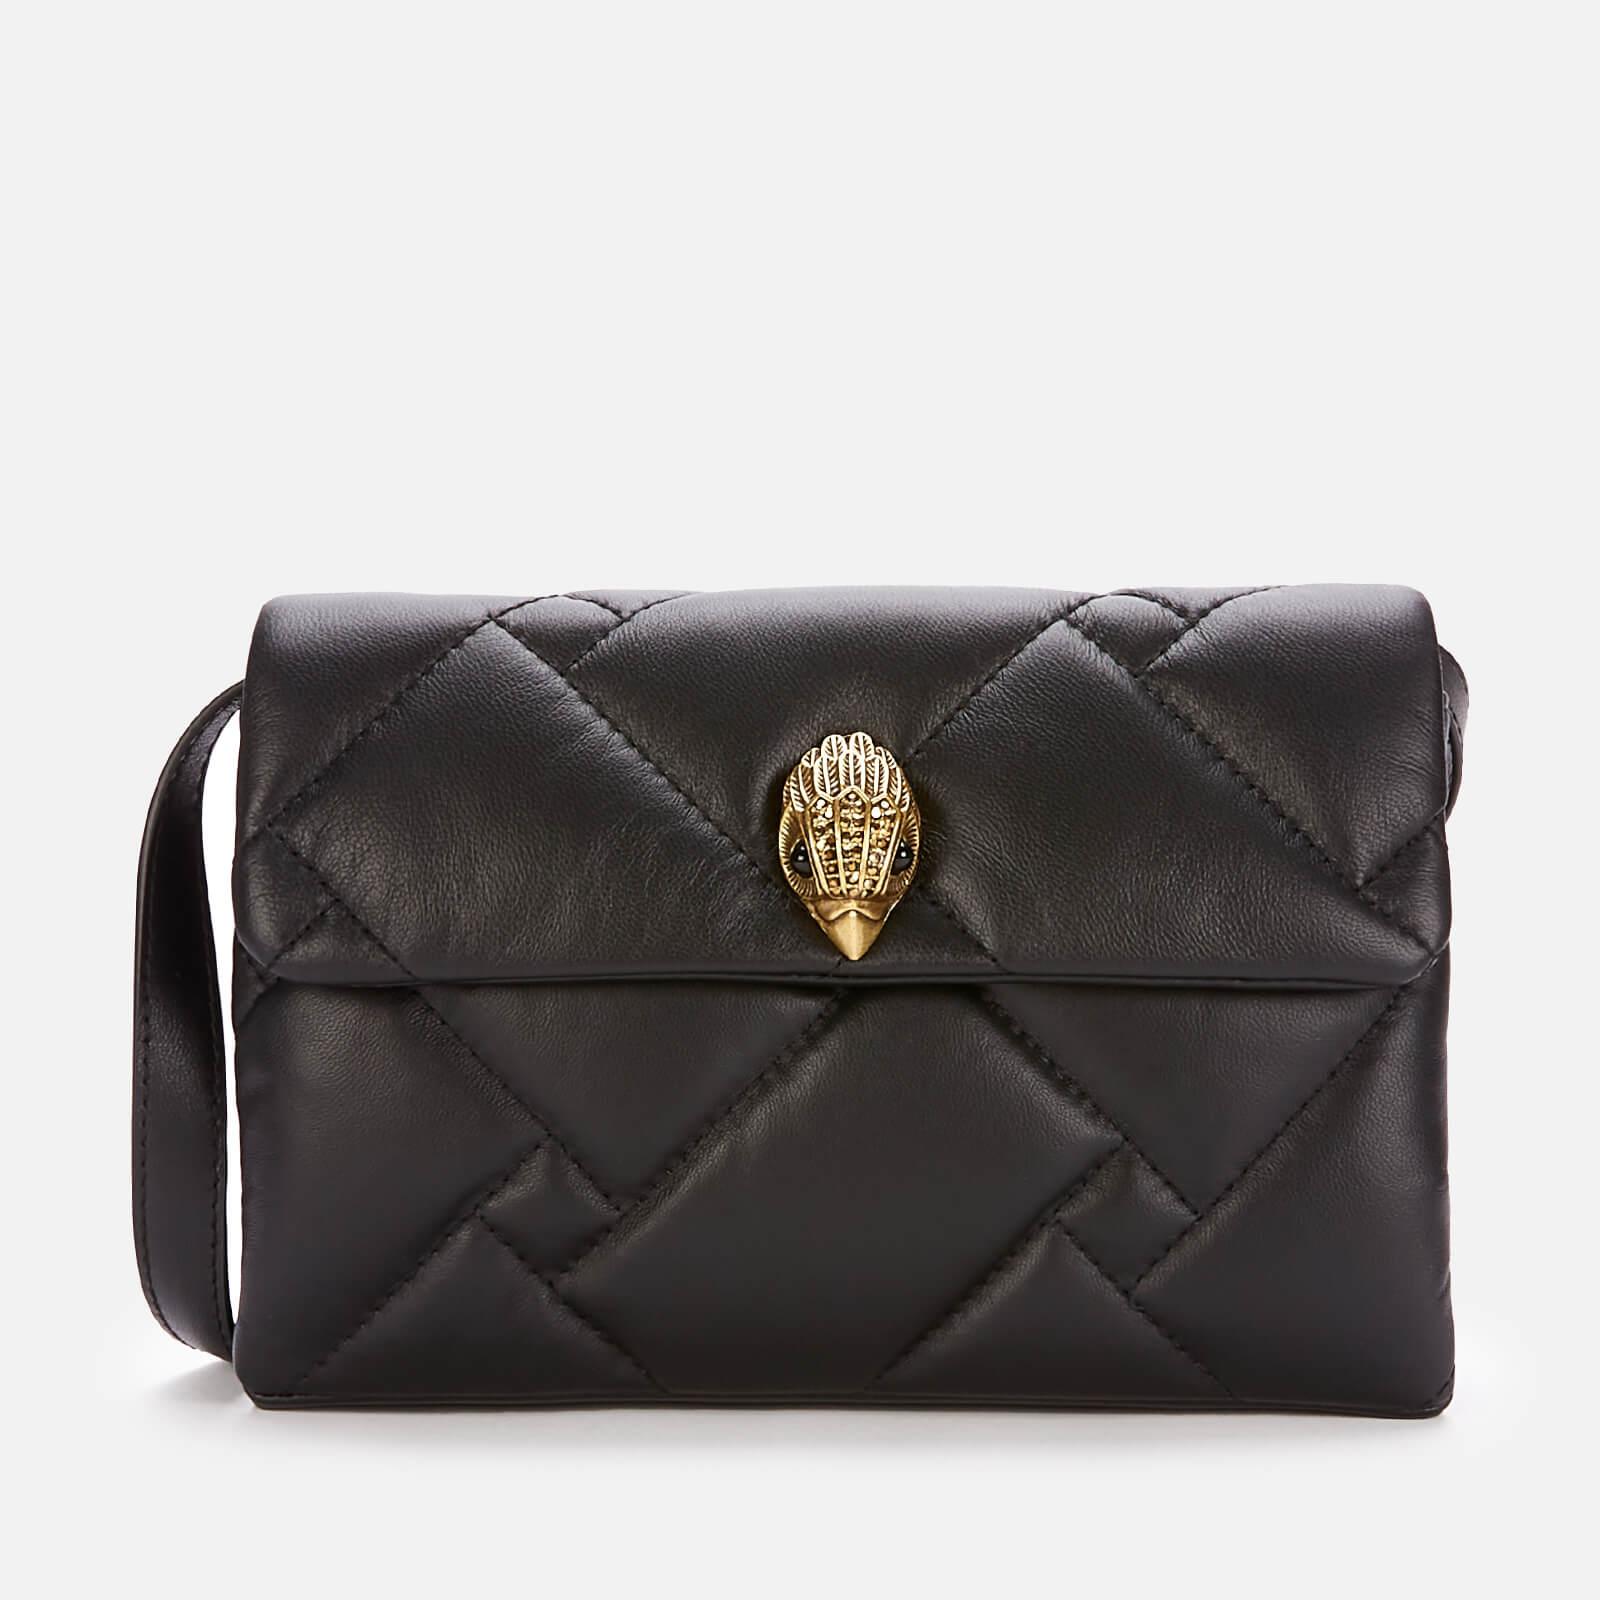 Kurt Geiger London Women's Medium Kensington Soft Cross Body Bag - Black